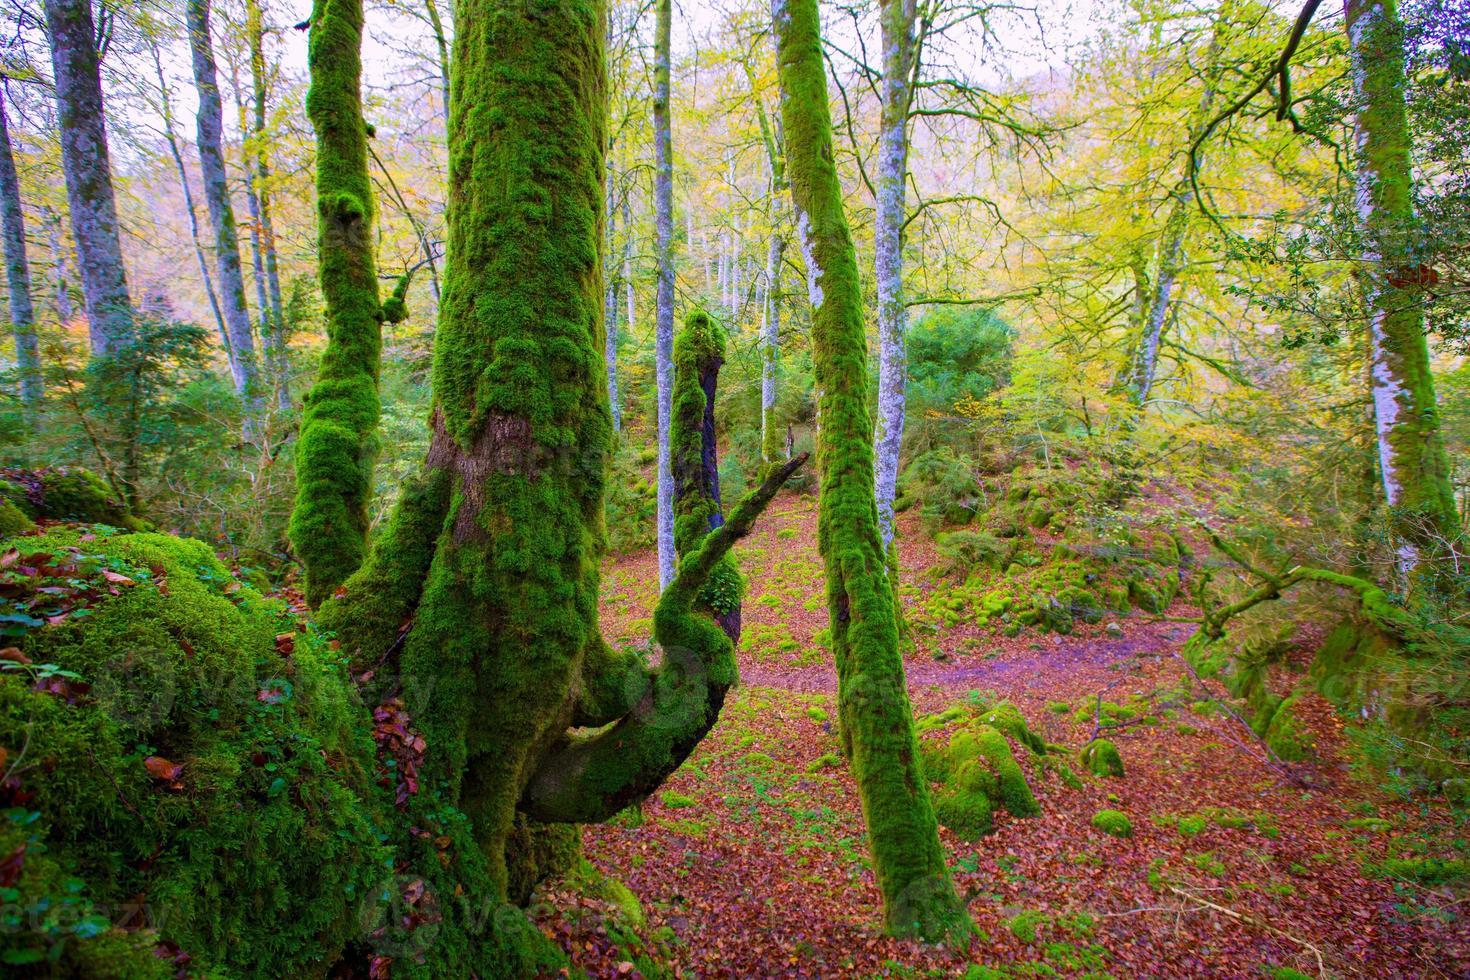 herfst selva de irati beuken jungle in Navarra Pyreneeën Spanje foto